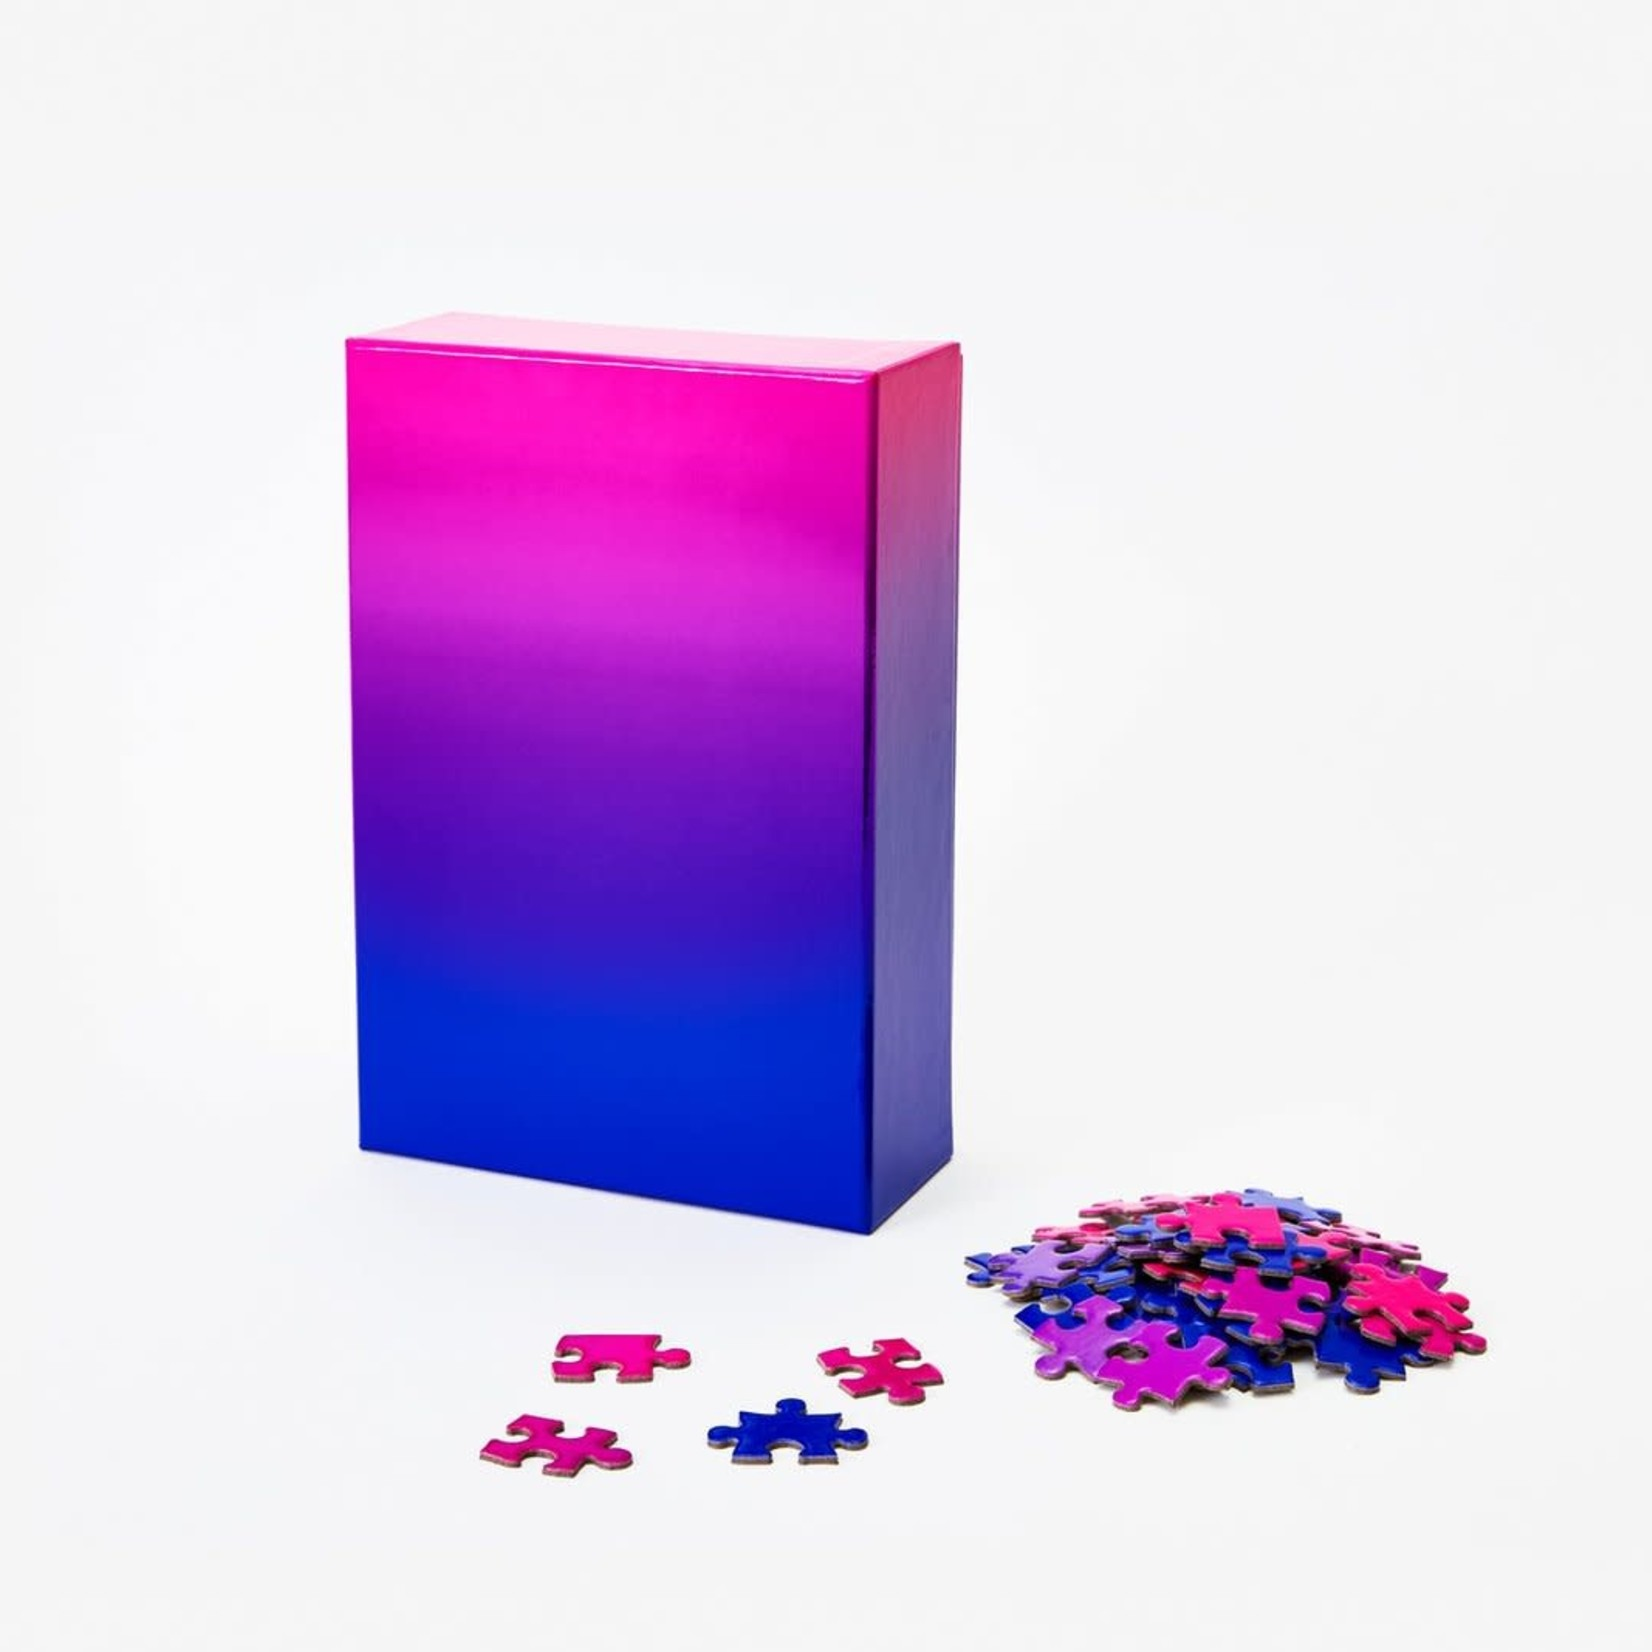 Areaware Areaware Gradient Puzzle Original Blue/Pink